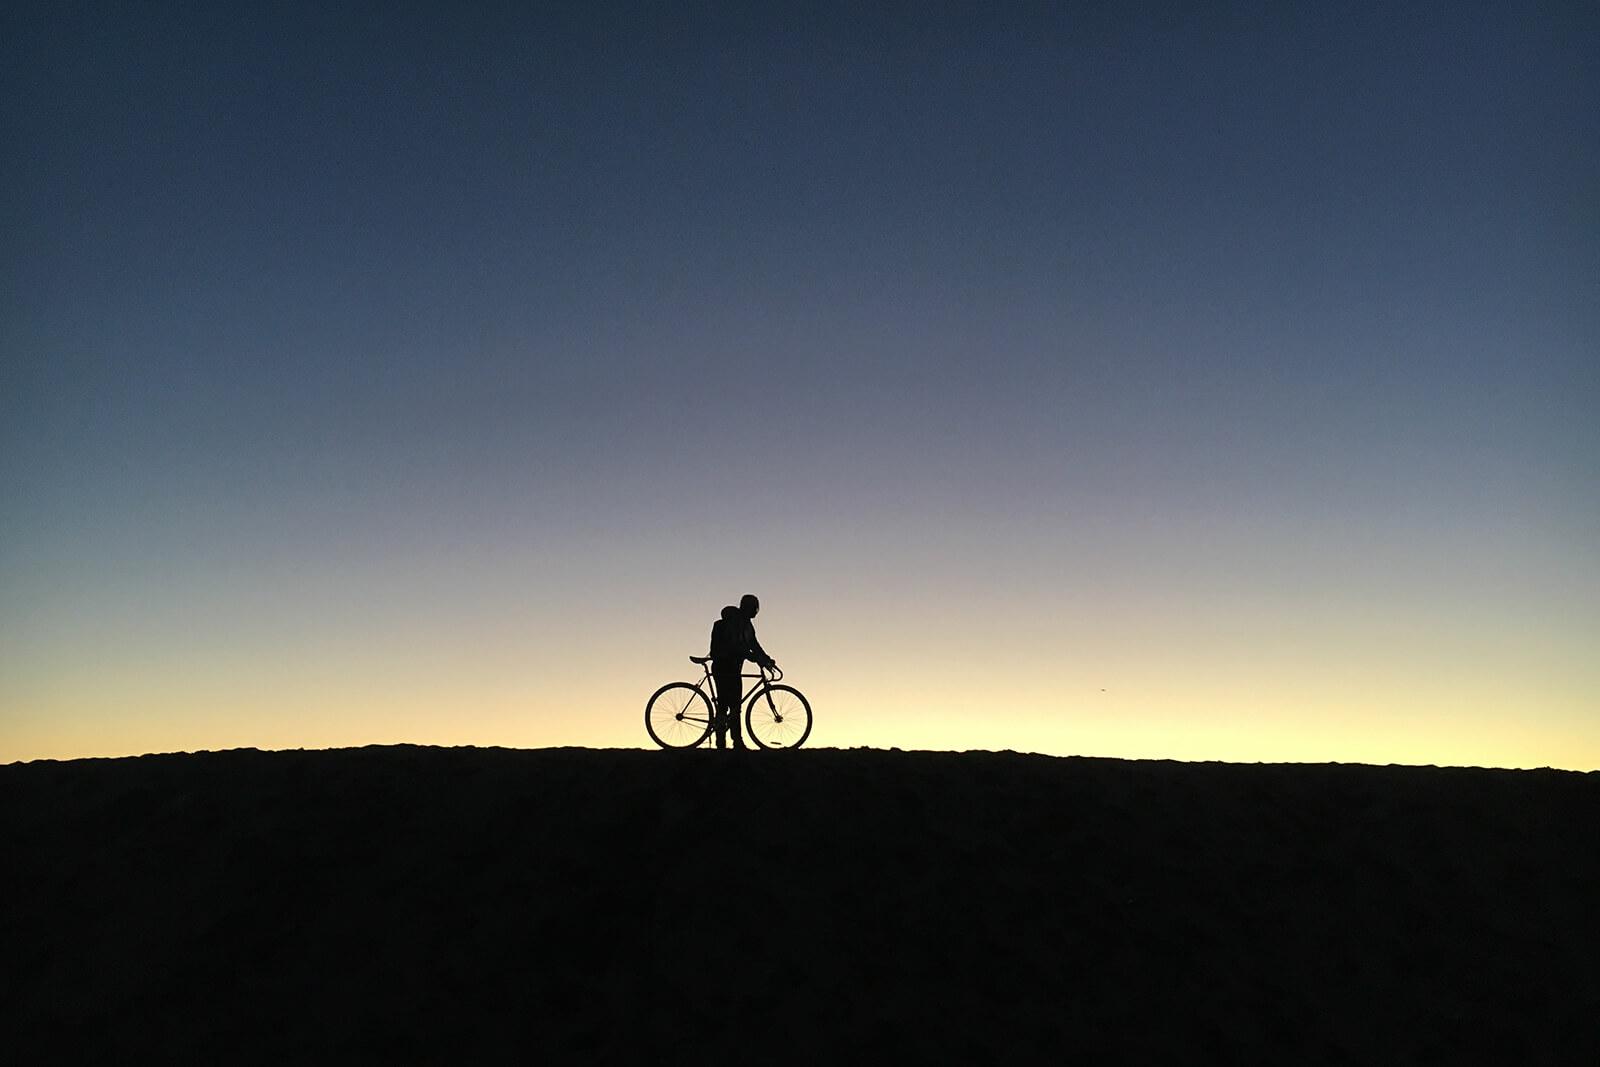 Sunset on the Marvin Braude Bike Trail, Manhattan Beach